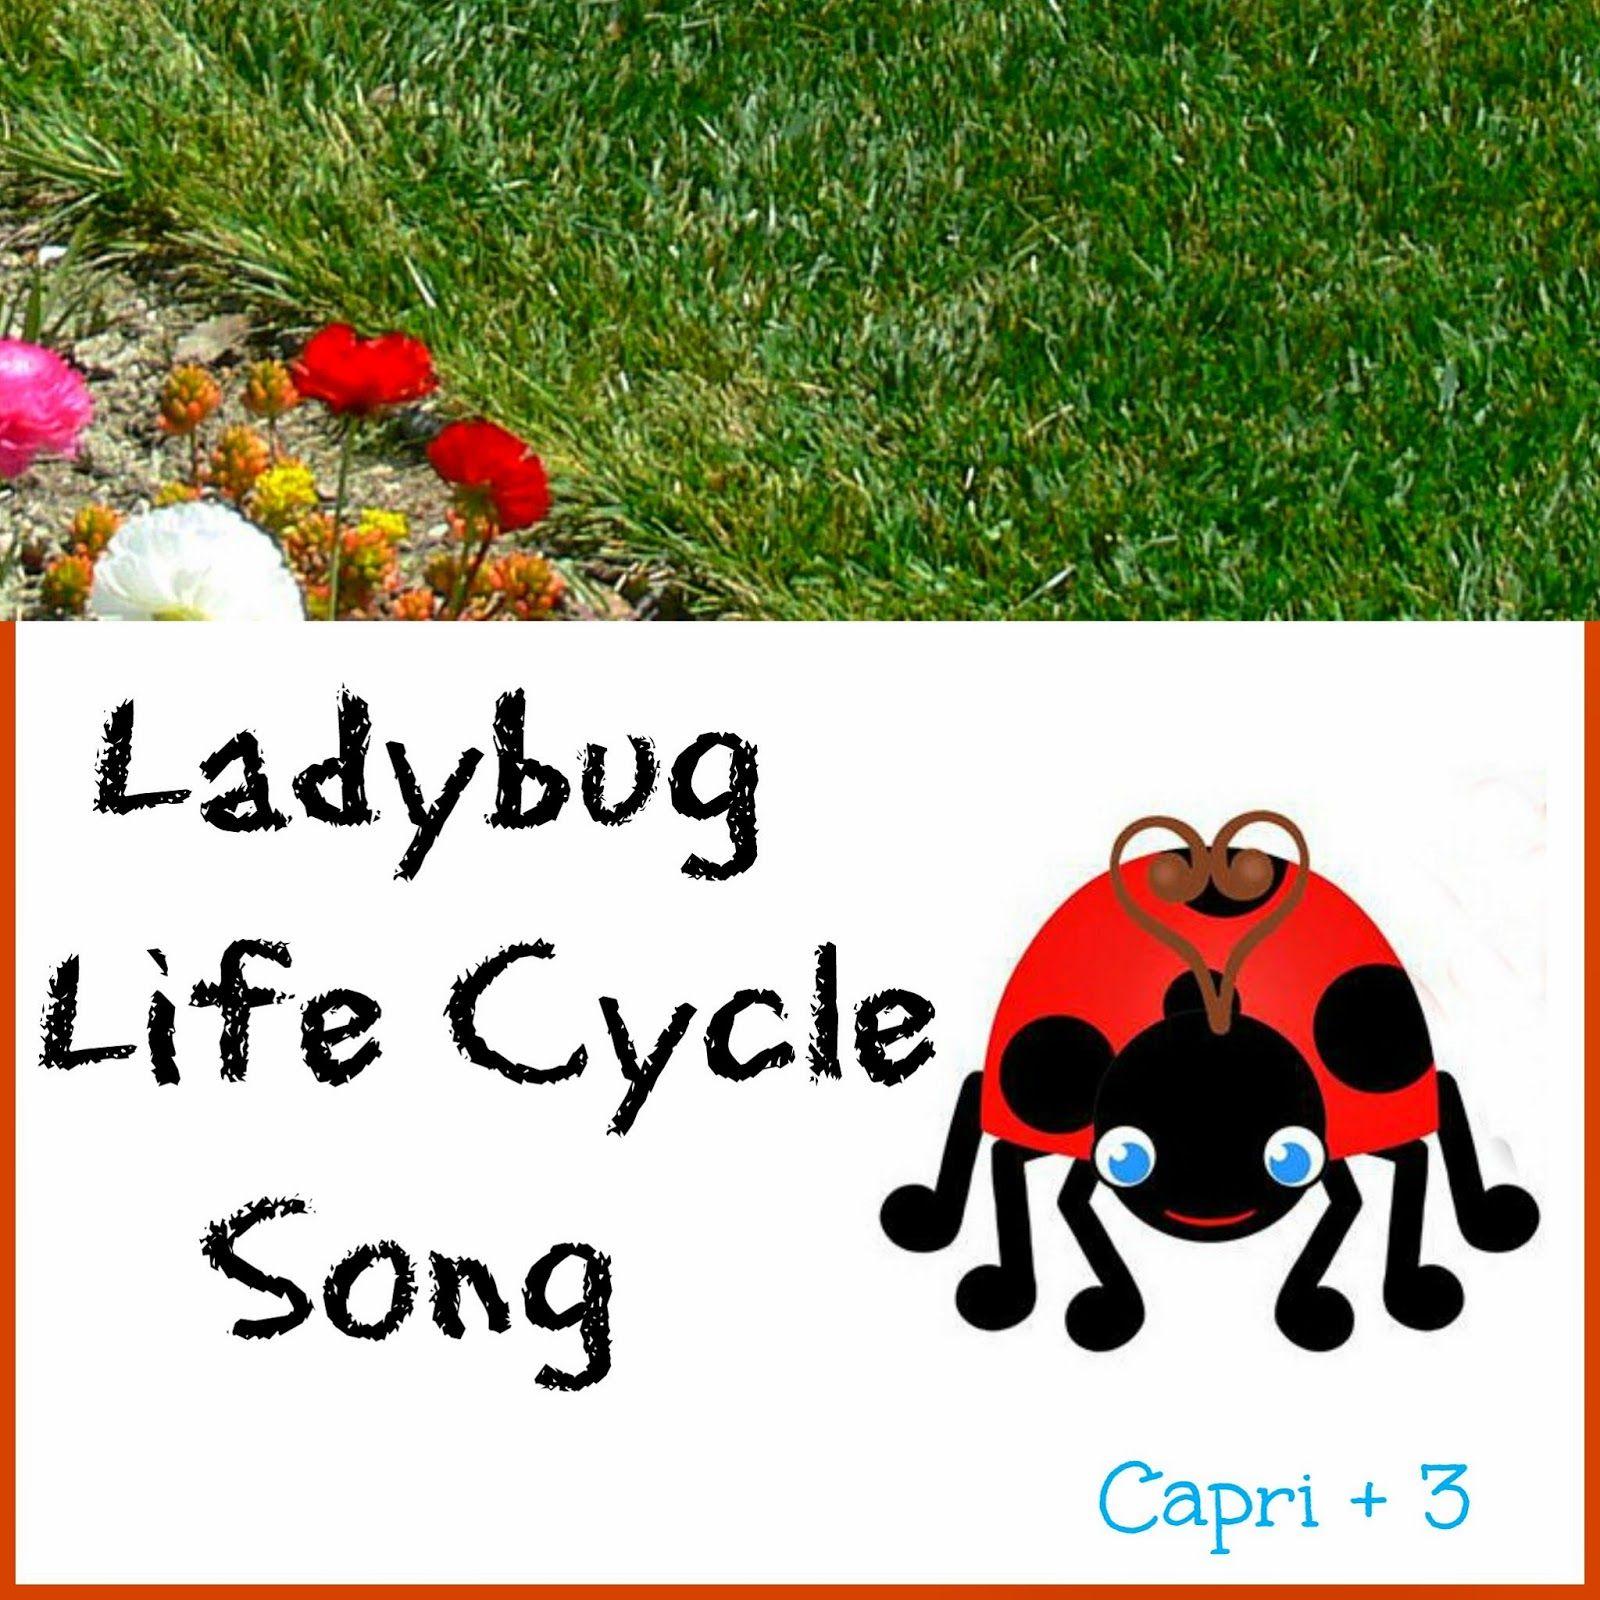 Ladybug Life Cycle Song Lyrics To The Tune Of The Wheels